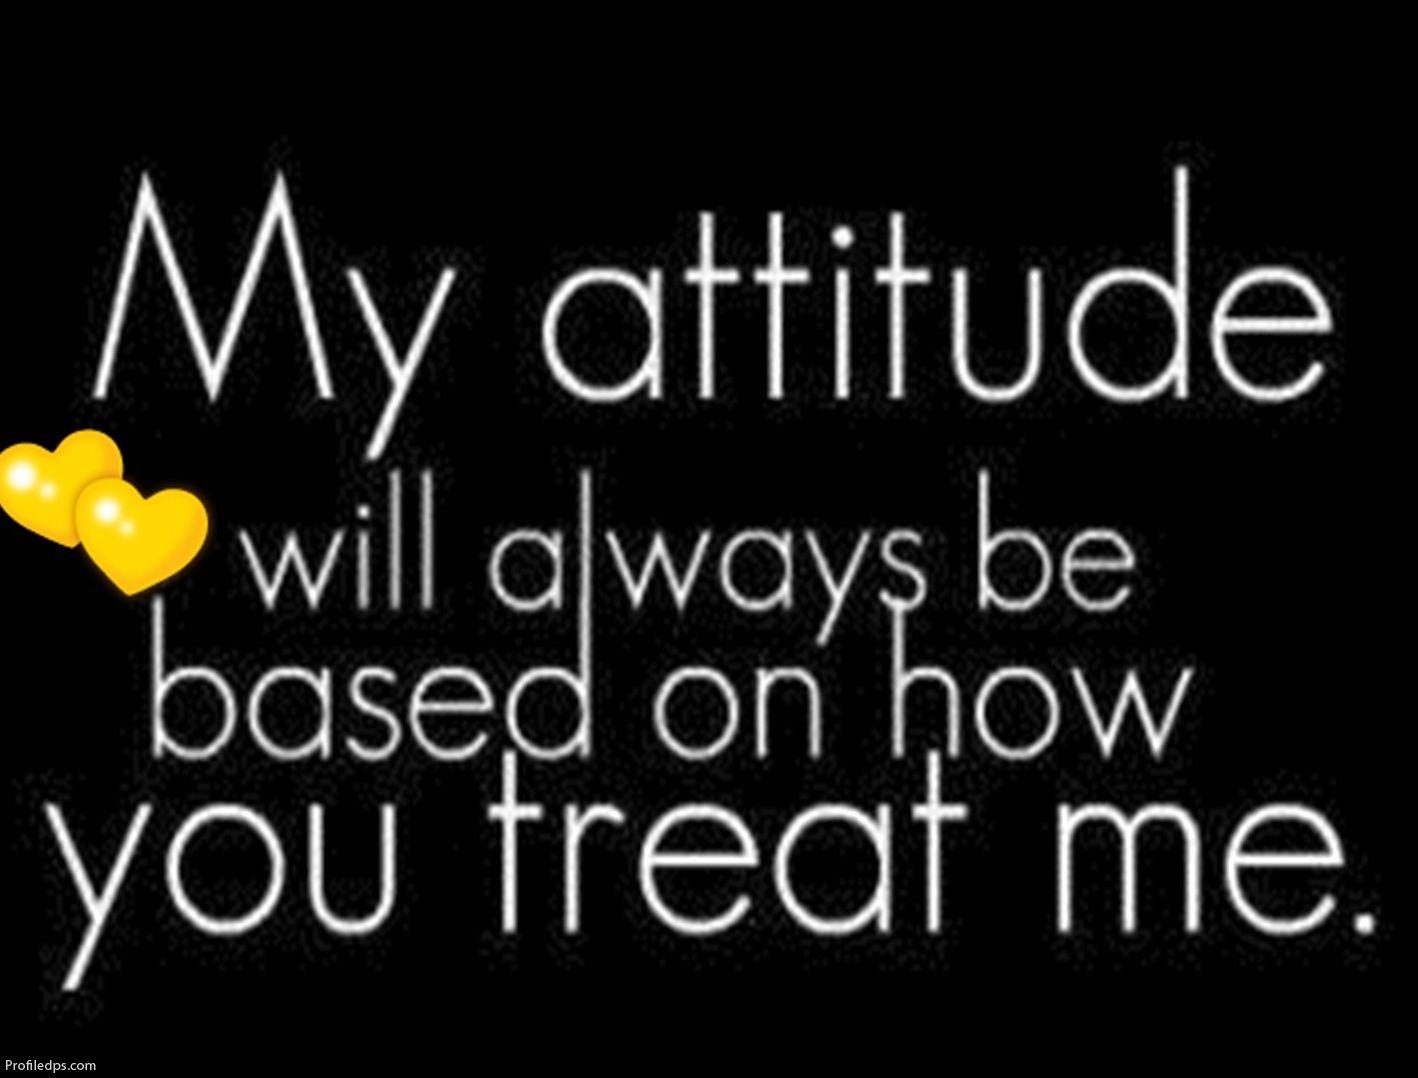 100 Cool Boys Dps Profile Pictures For Whatsapp Facebook Attitude Quotes Bad Attitude Quotes Positive Attitude Quotes